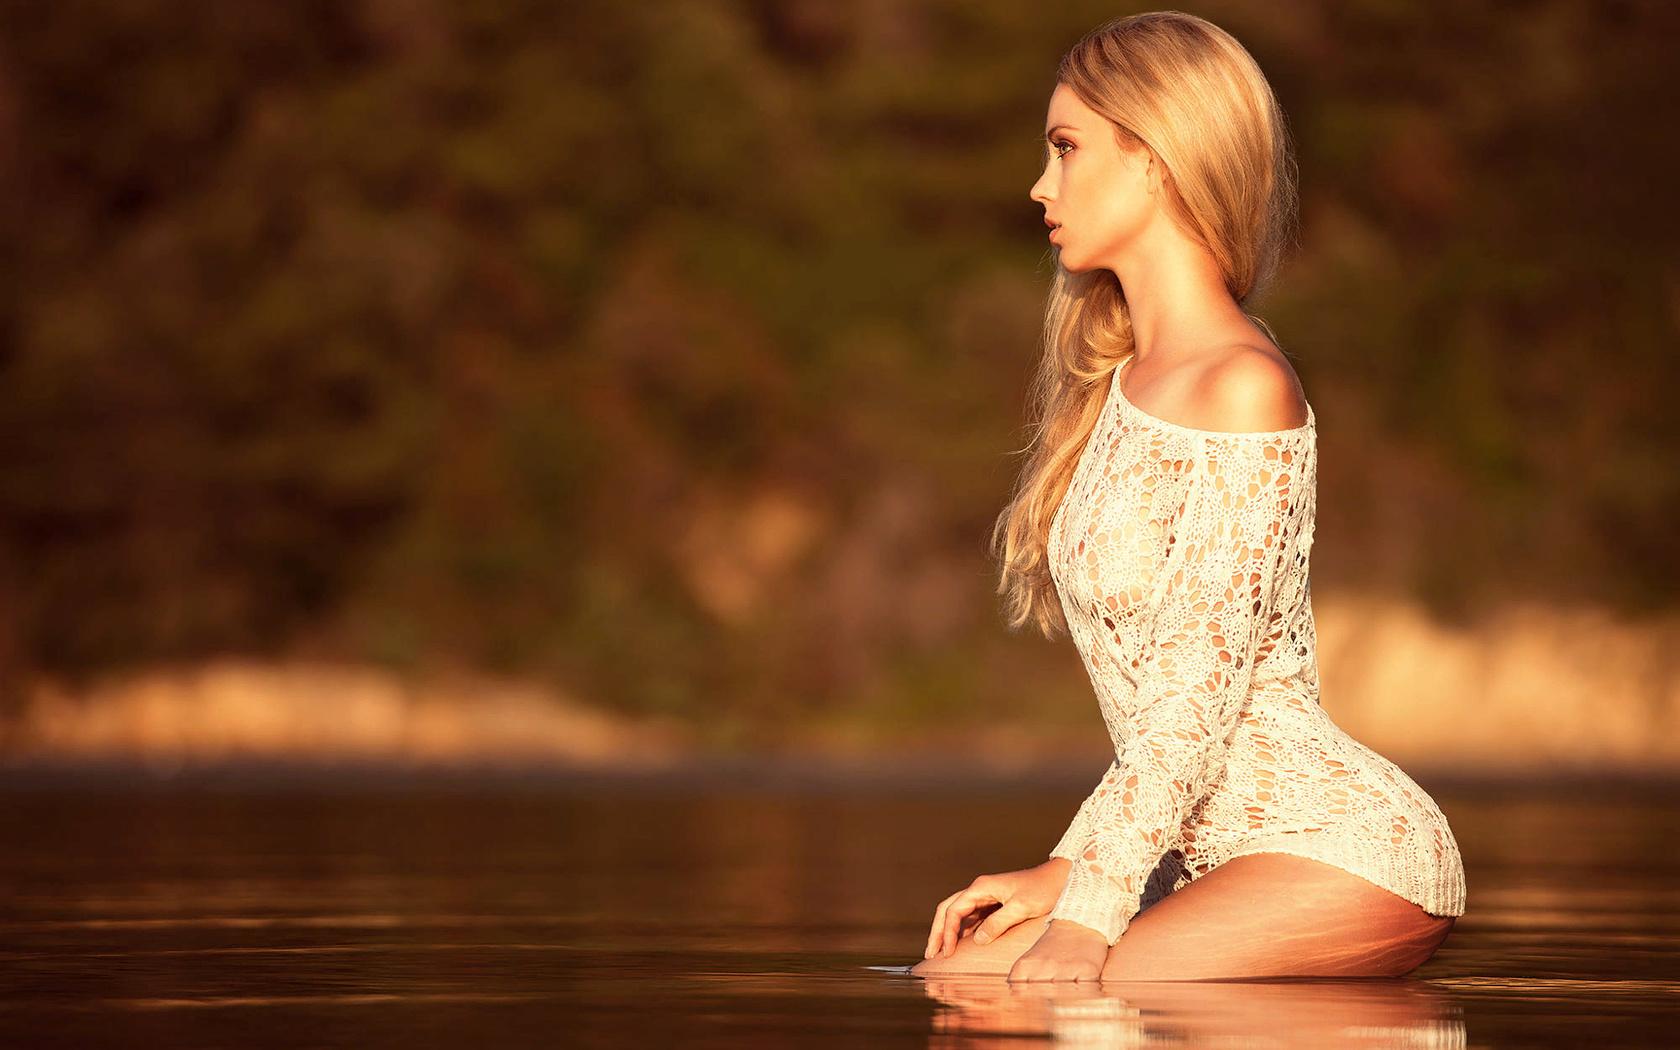 miki macovei, девушка, блондинка, кофточка, поза, профиль, вода